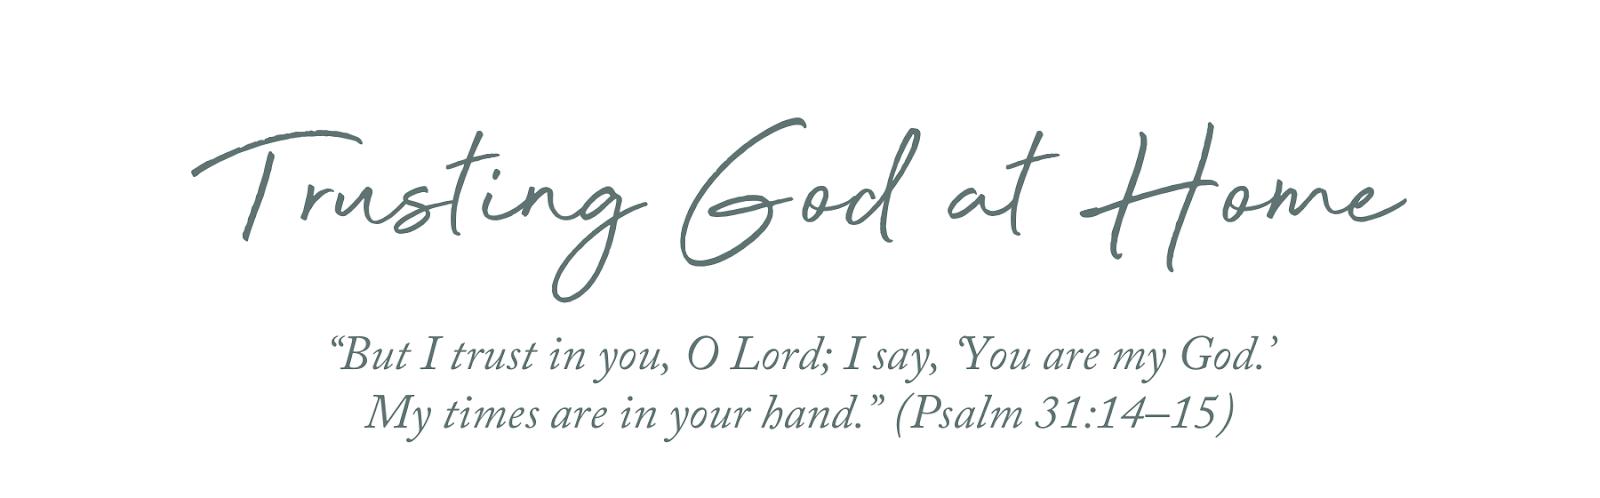 Trusting God At Home